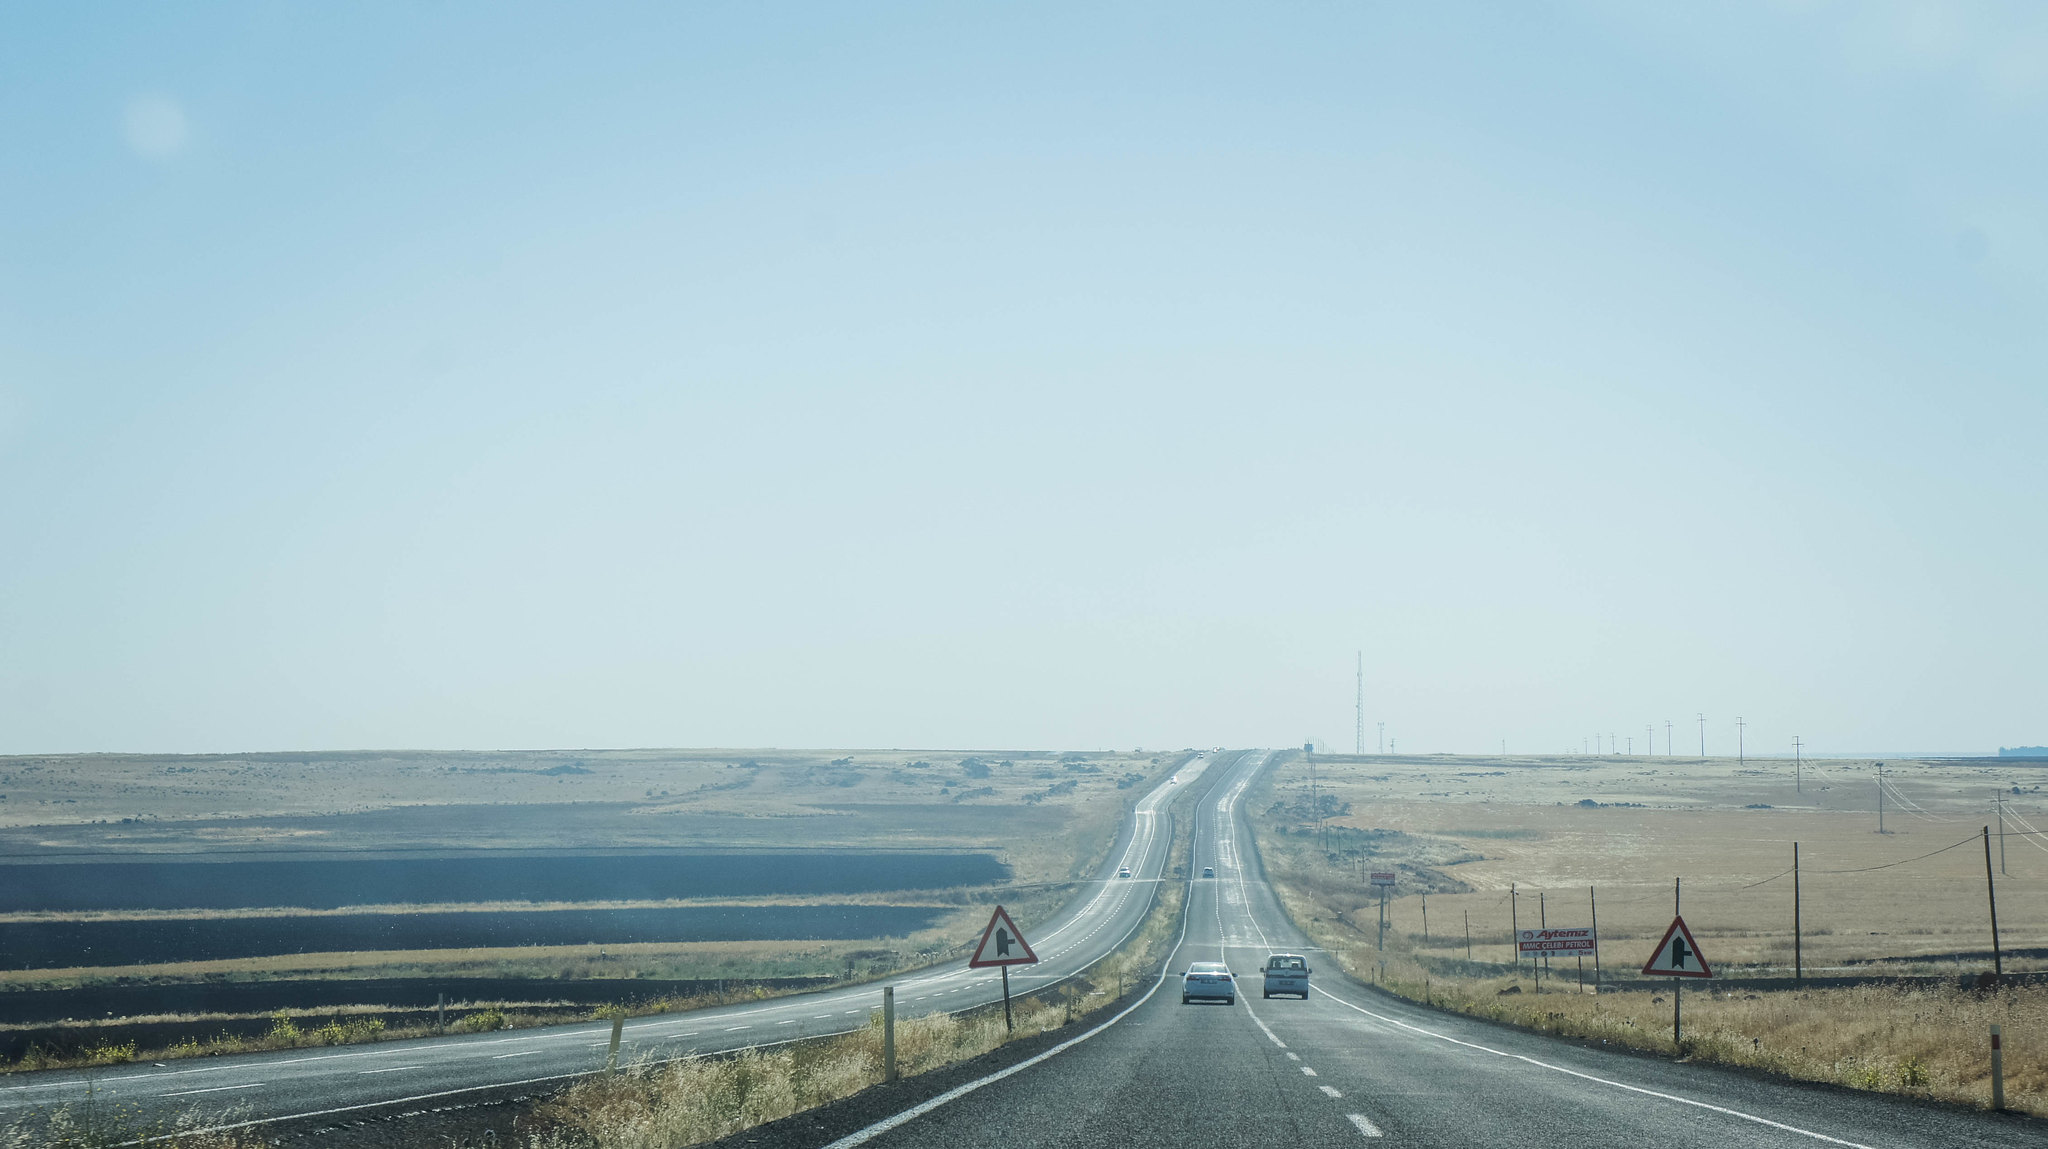 Road trip to Nemrut Dağ!